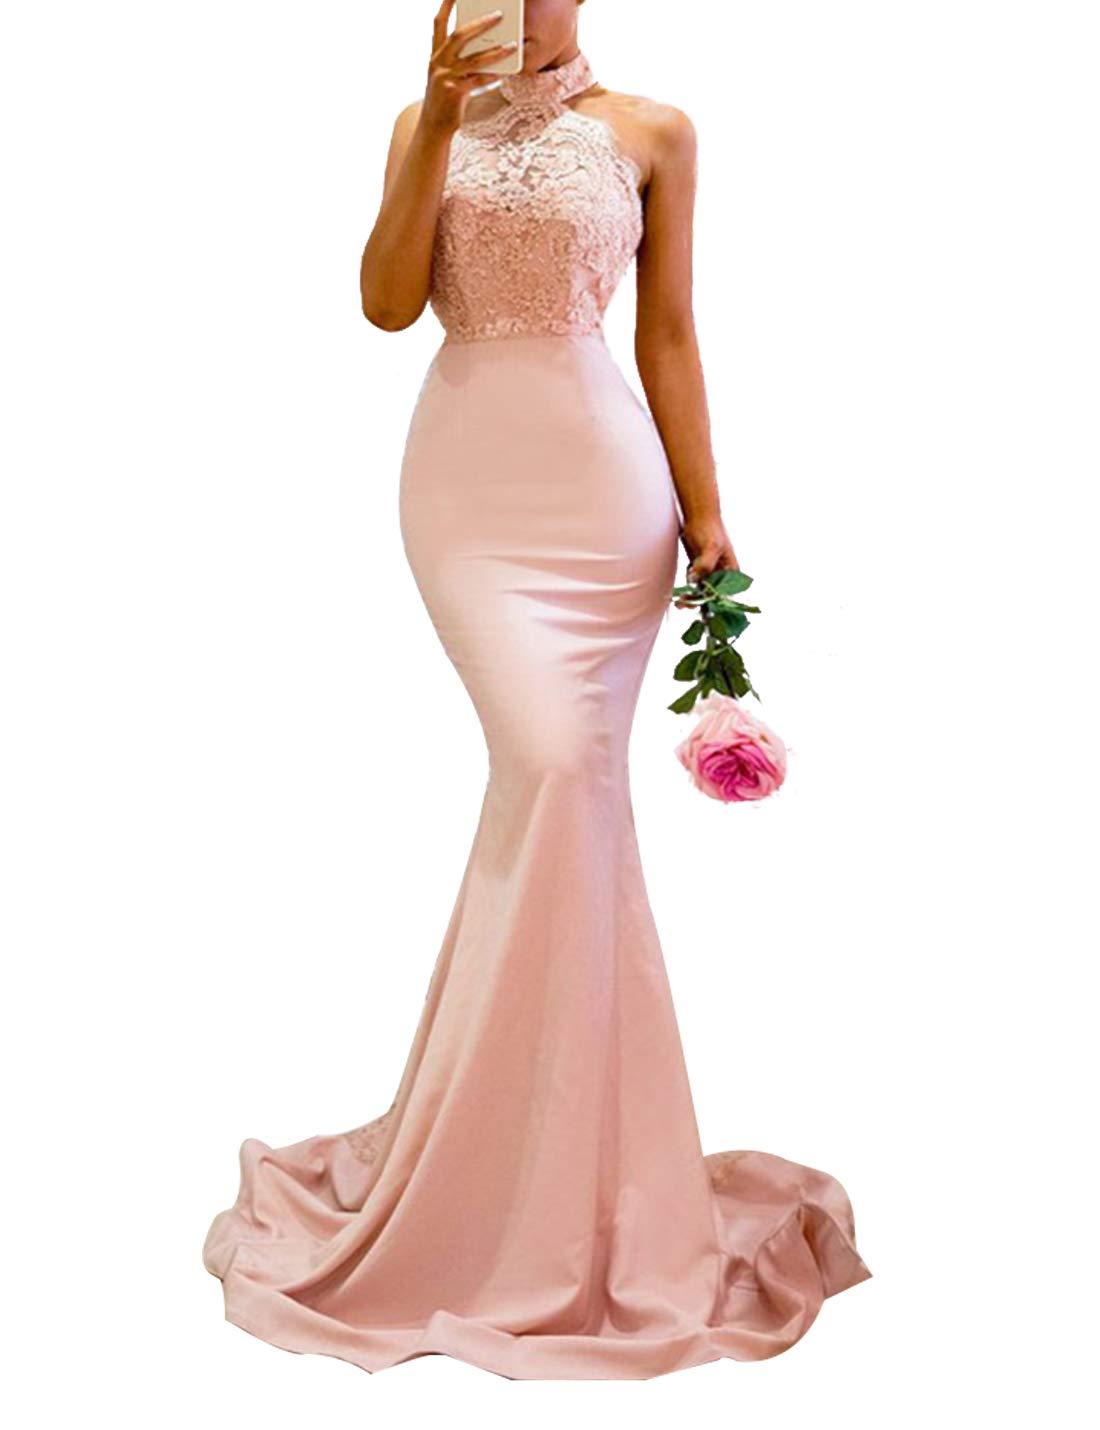 M_Eshop Women's Sheath Sexy Vintage Floral Lace Backless Mermaid Bridal Wedding Maxi Formal Long Dress (Pink 04, M) by M_Eshop